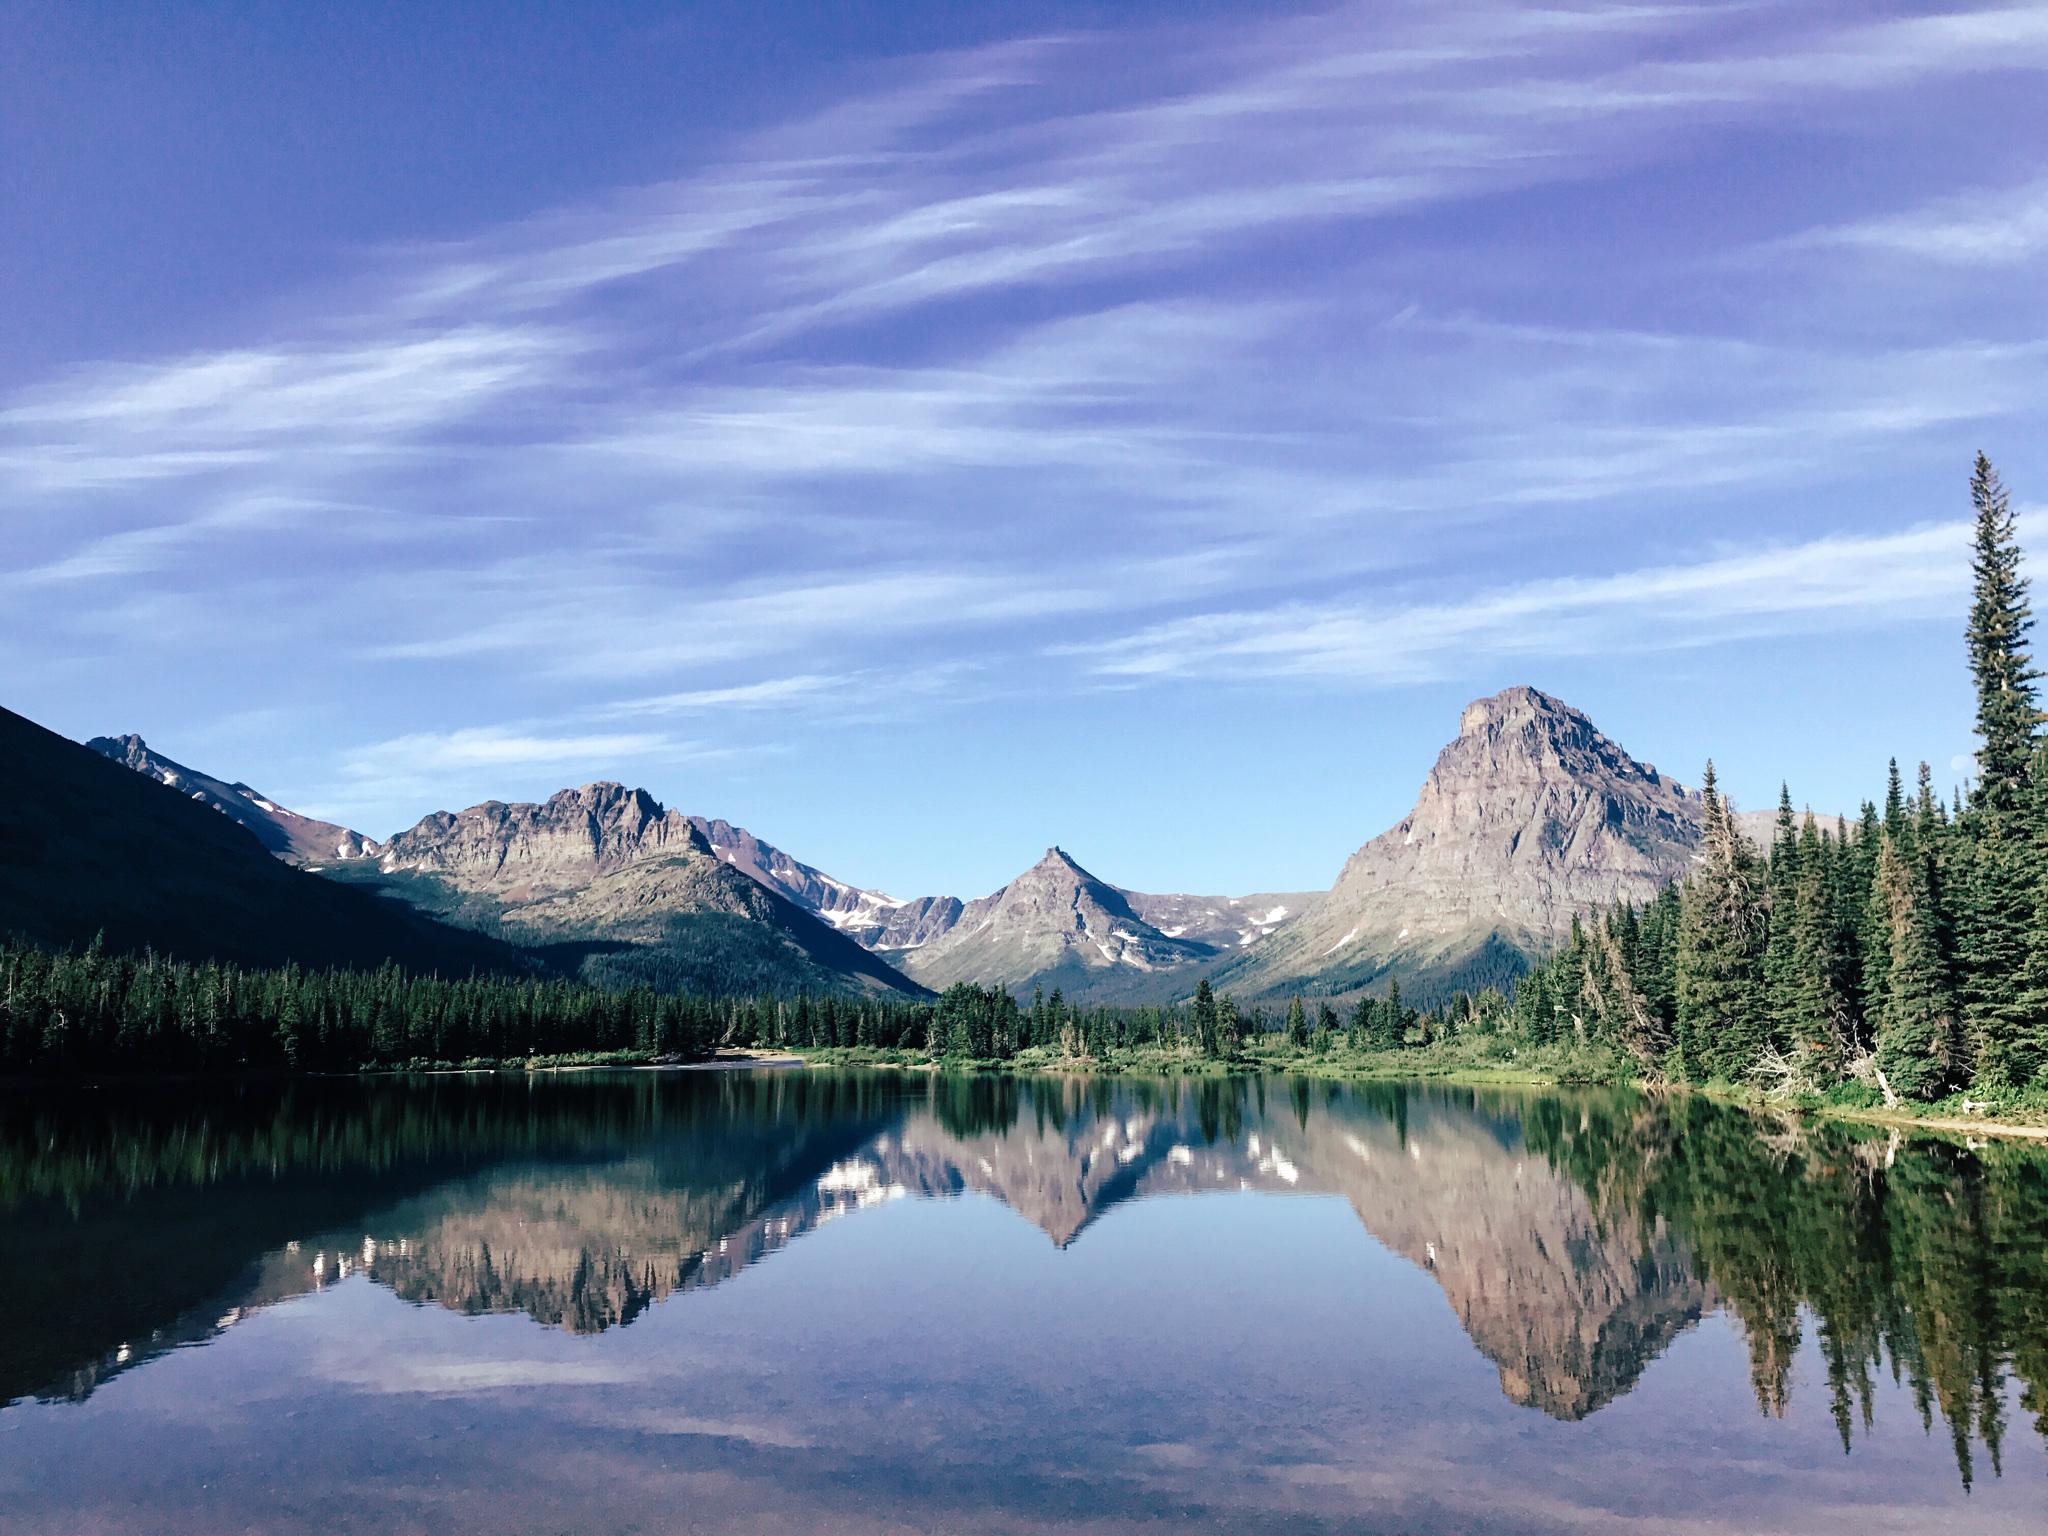 Two Medicine Area in Glacier National Park